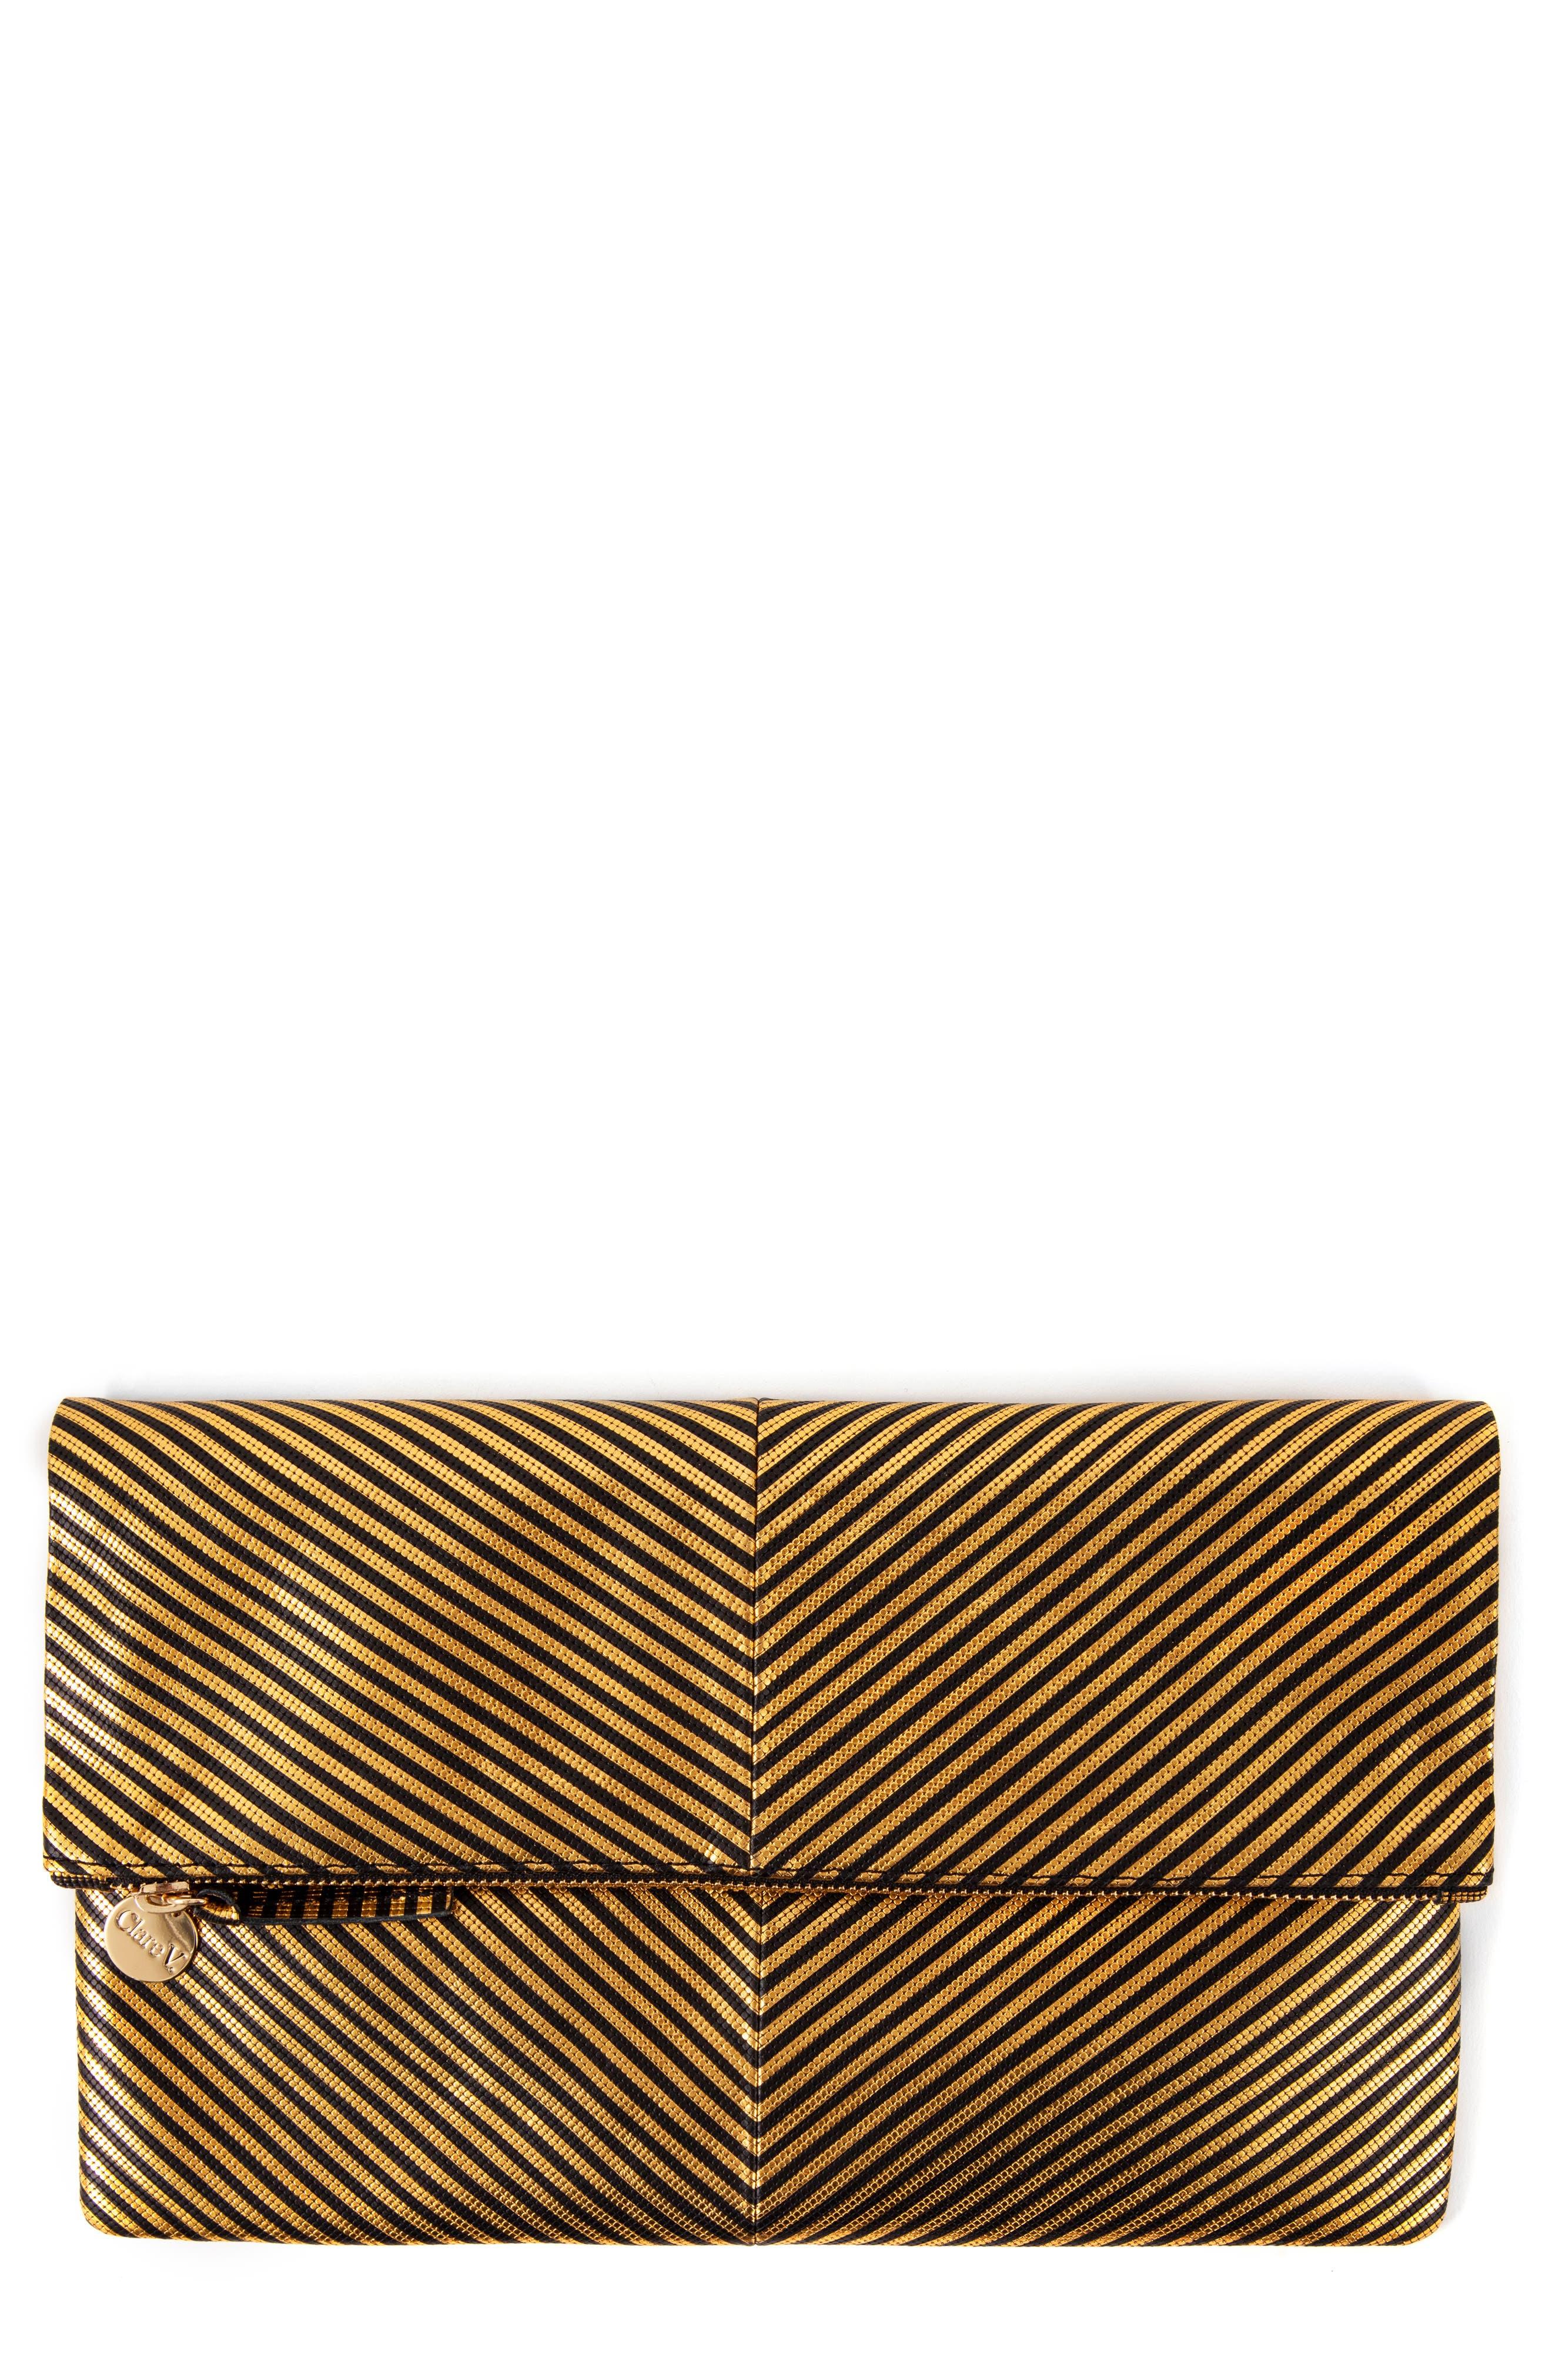 Disco Stripe Foldover Clutch,                             Main thumbnail 1, color,                             DISCO STRIPE PATCHWORK BLACK